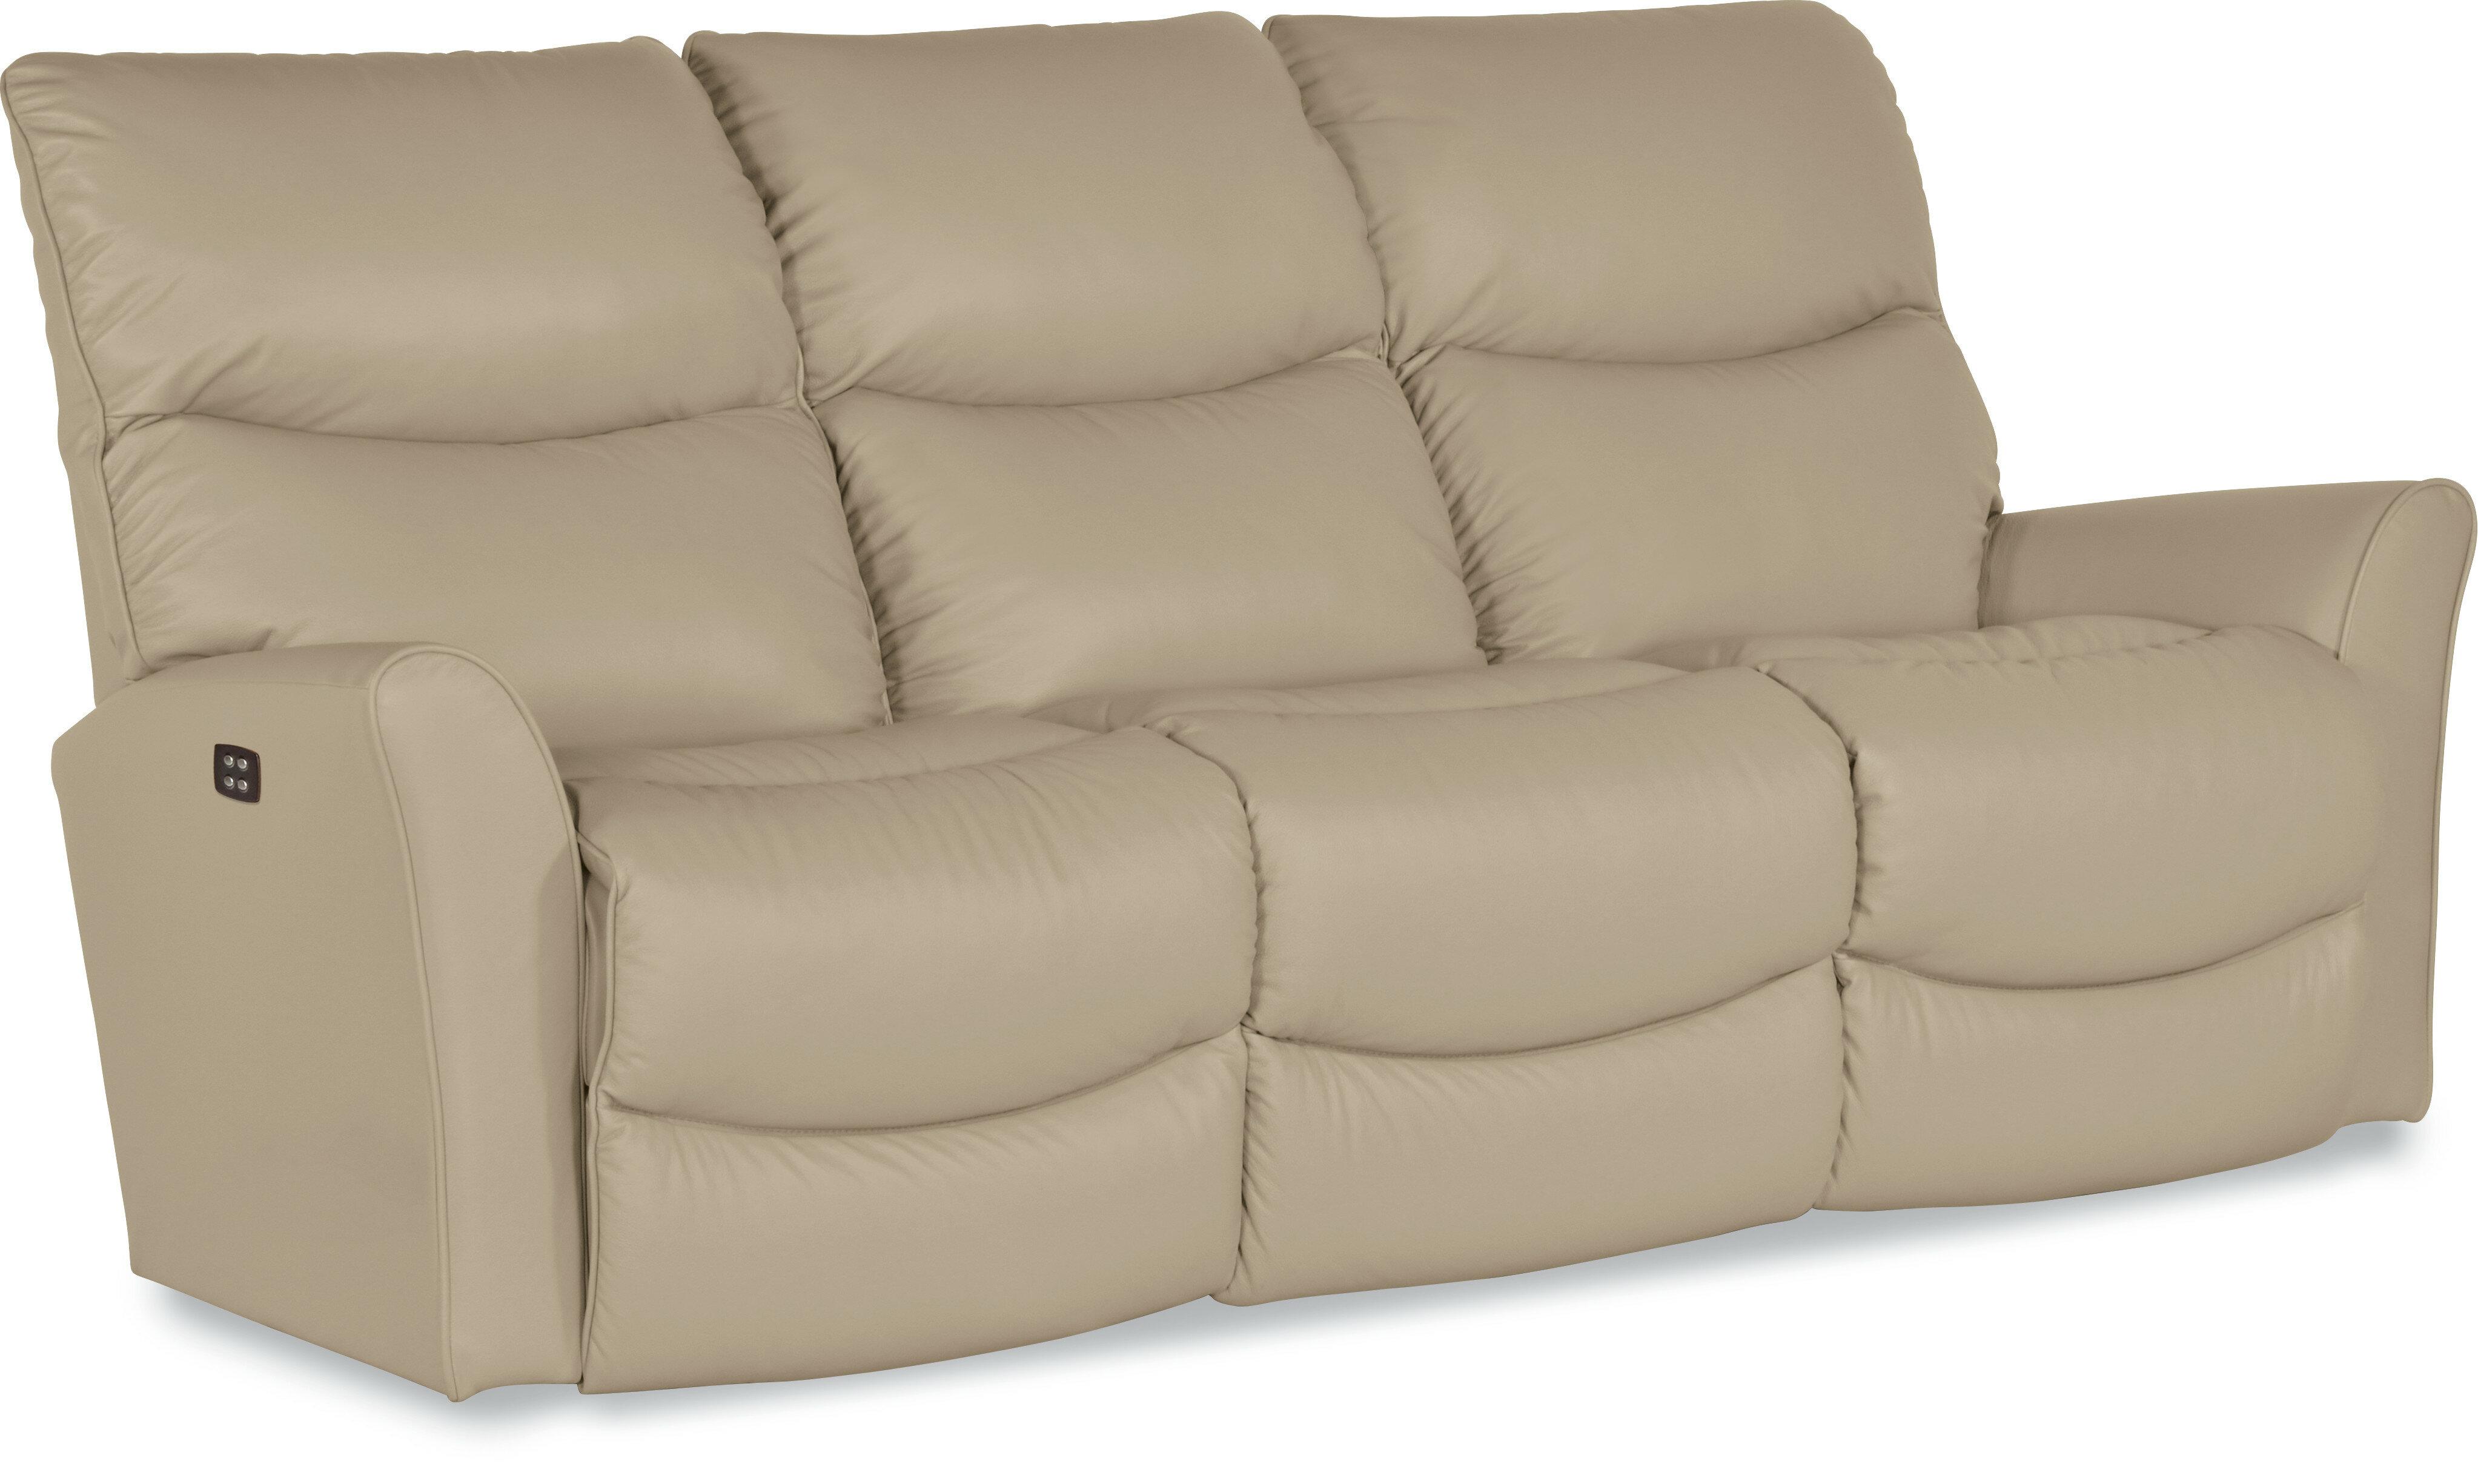 products sofa recliner ihnq width godfrey item power threshold bassett reclining mushroom leather height godfreymushroom trim